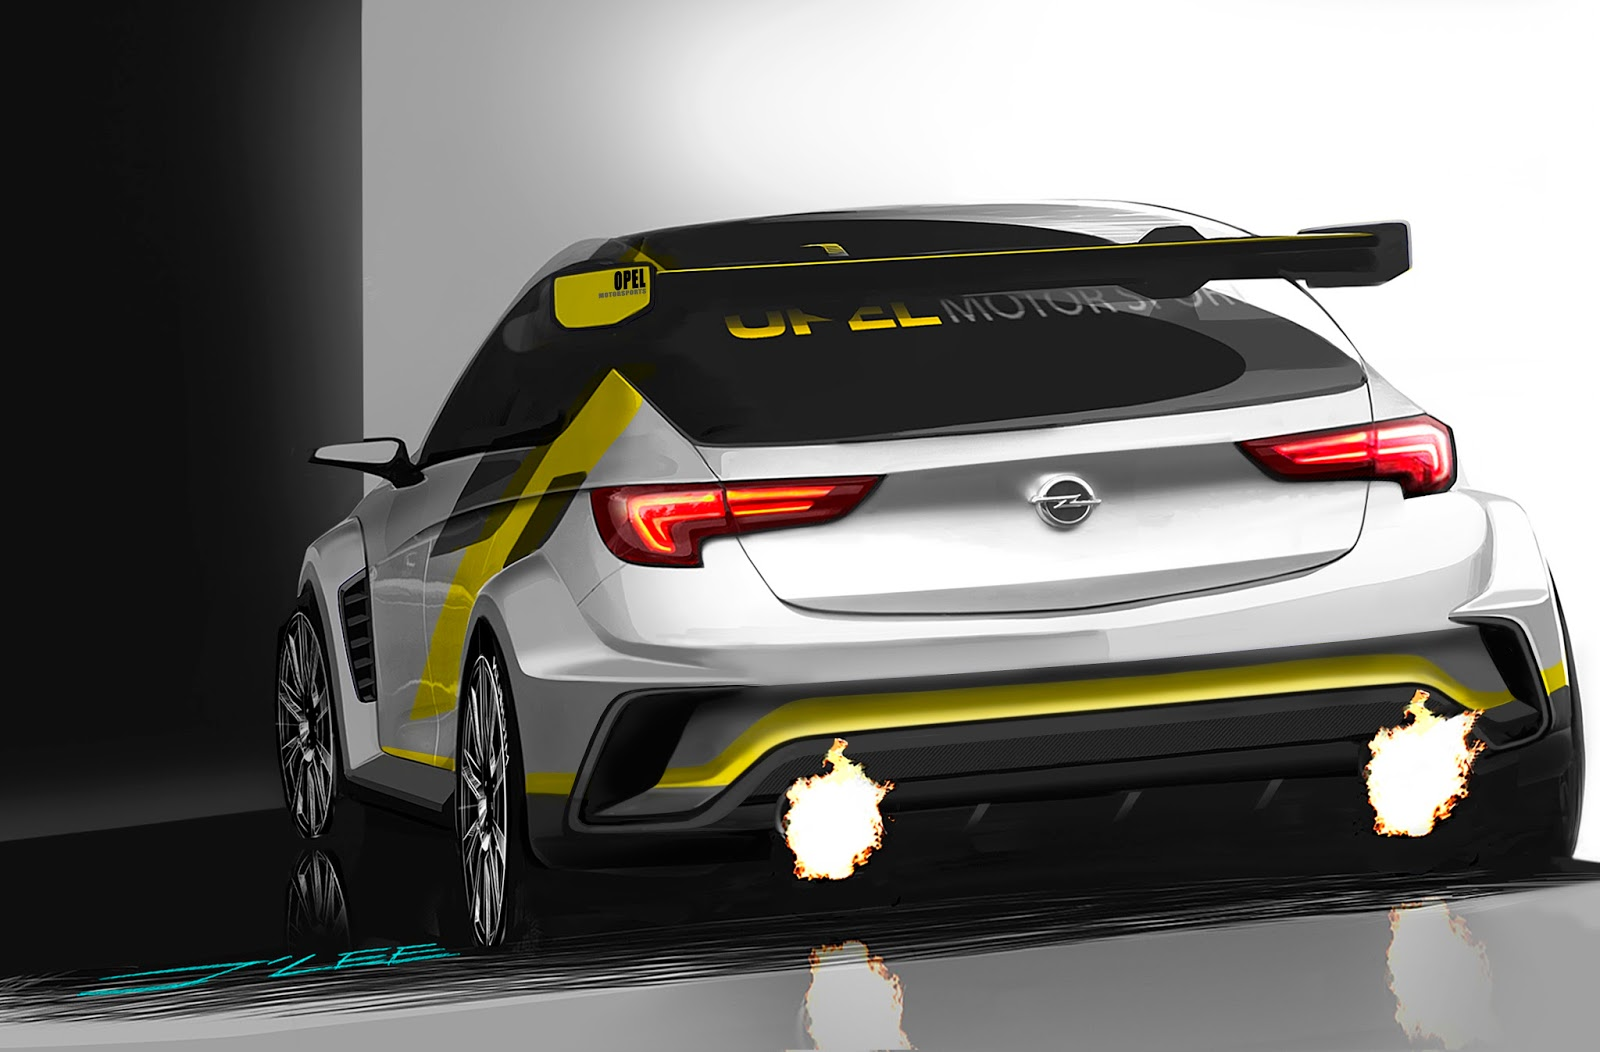 Opel Astra TCR 298015 Opel Astra TCR: Έτοιμο αγωνιστικό για το Nürburgring με 330 άλογα Hatcback, Nurburgring, Opel, Opel Astra, Opel Astra TCR, Rally